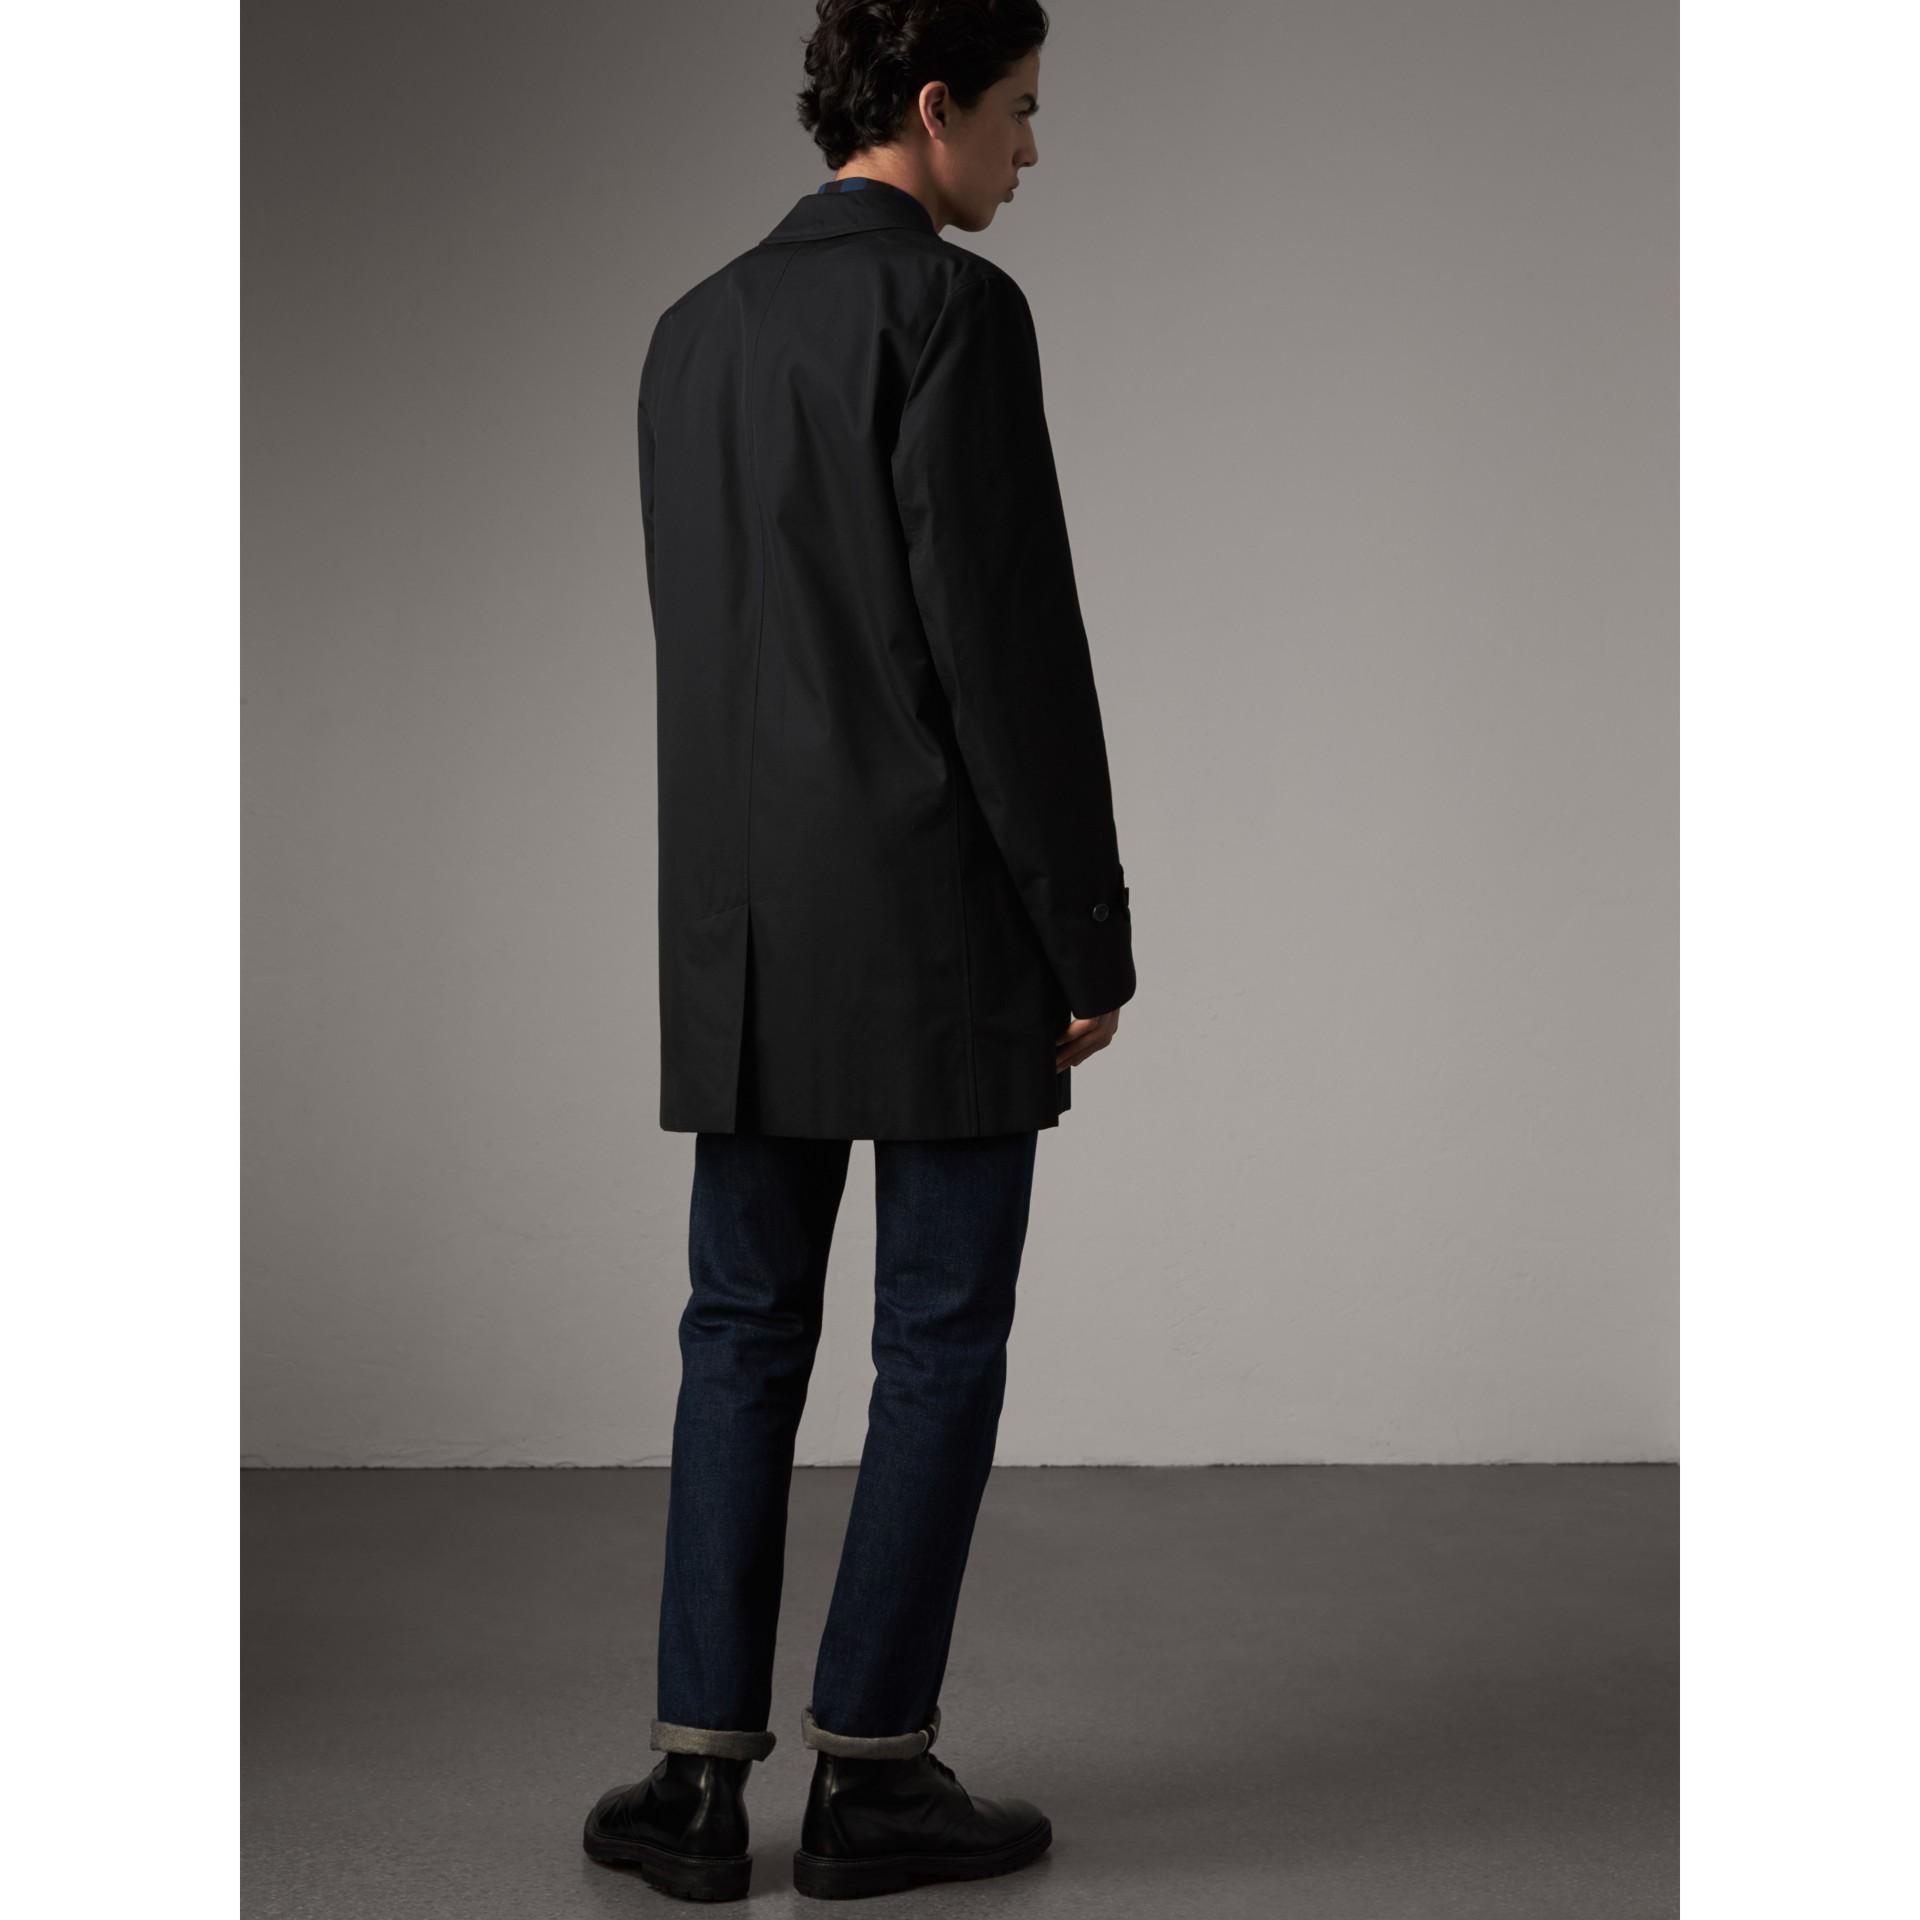 Kurzmantel aus Baumwollgabardine (Schwarz) - Herren | Burberry - Galerie-Bild 3